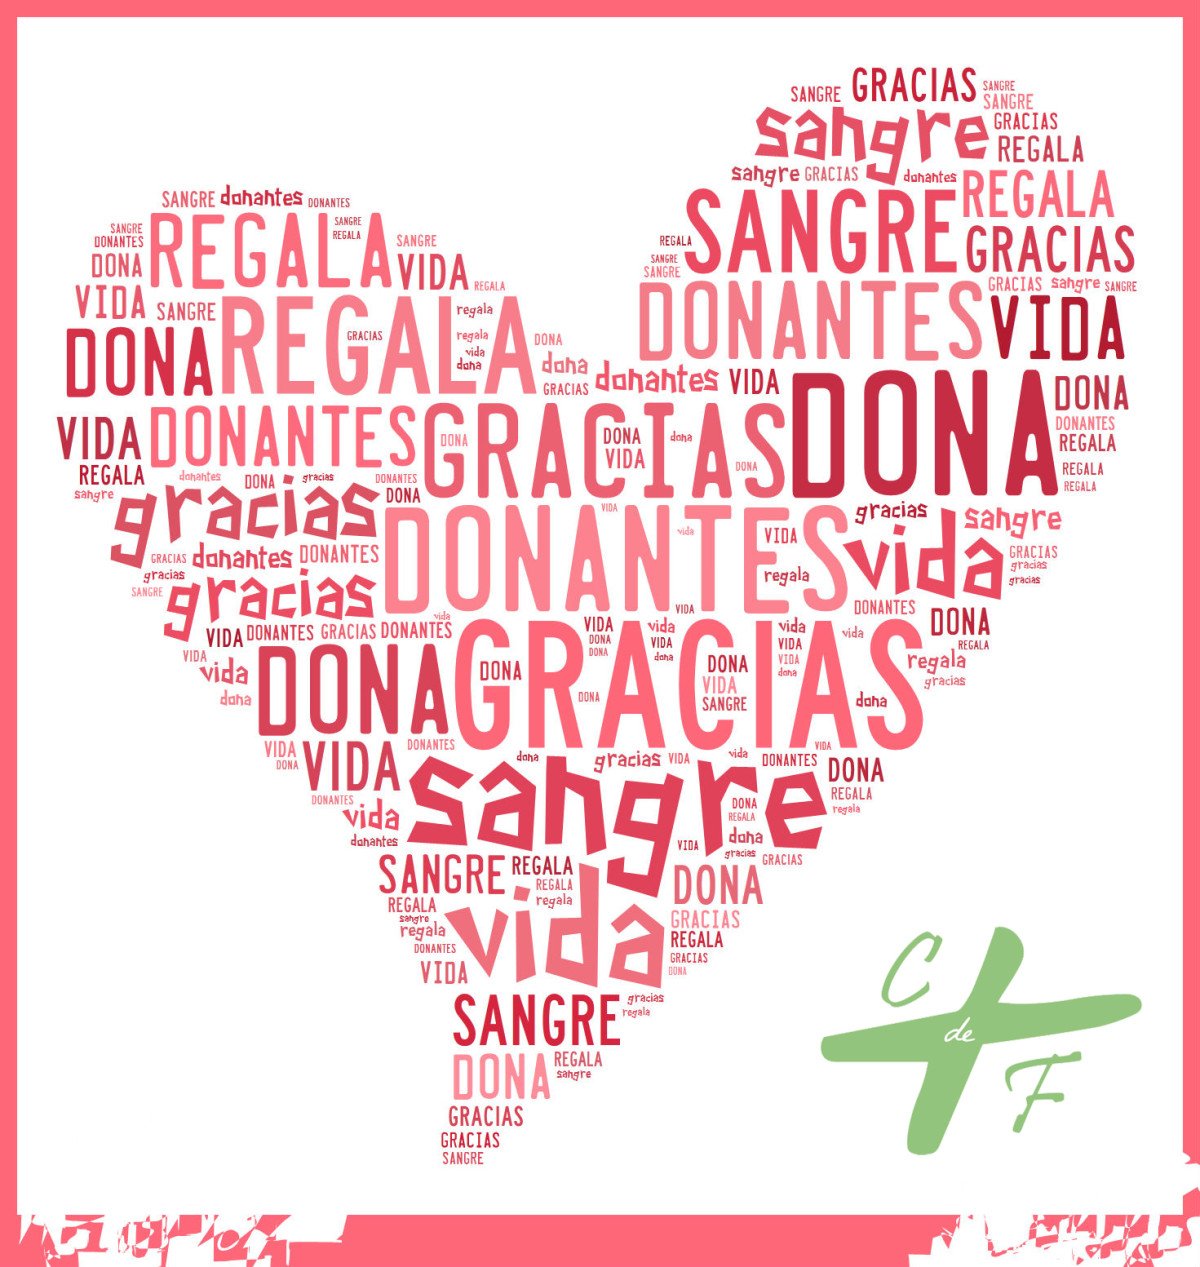 gracias dia mundial donantes sangre